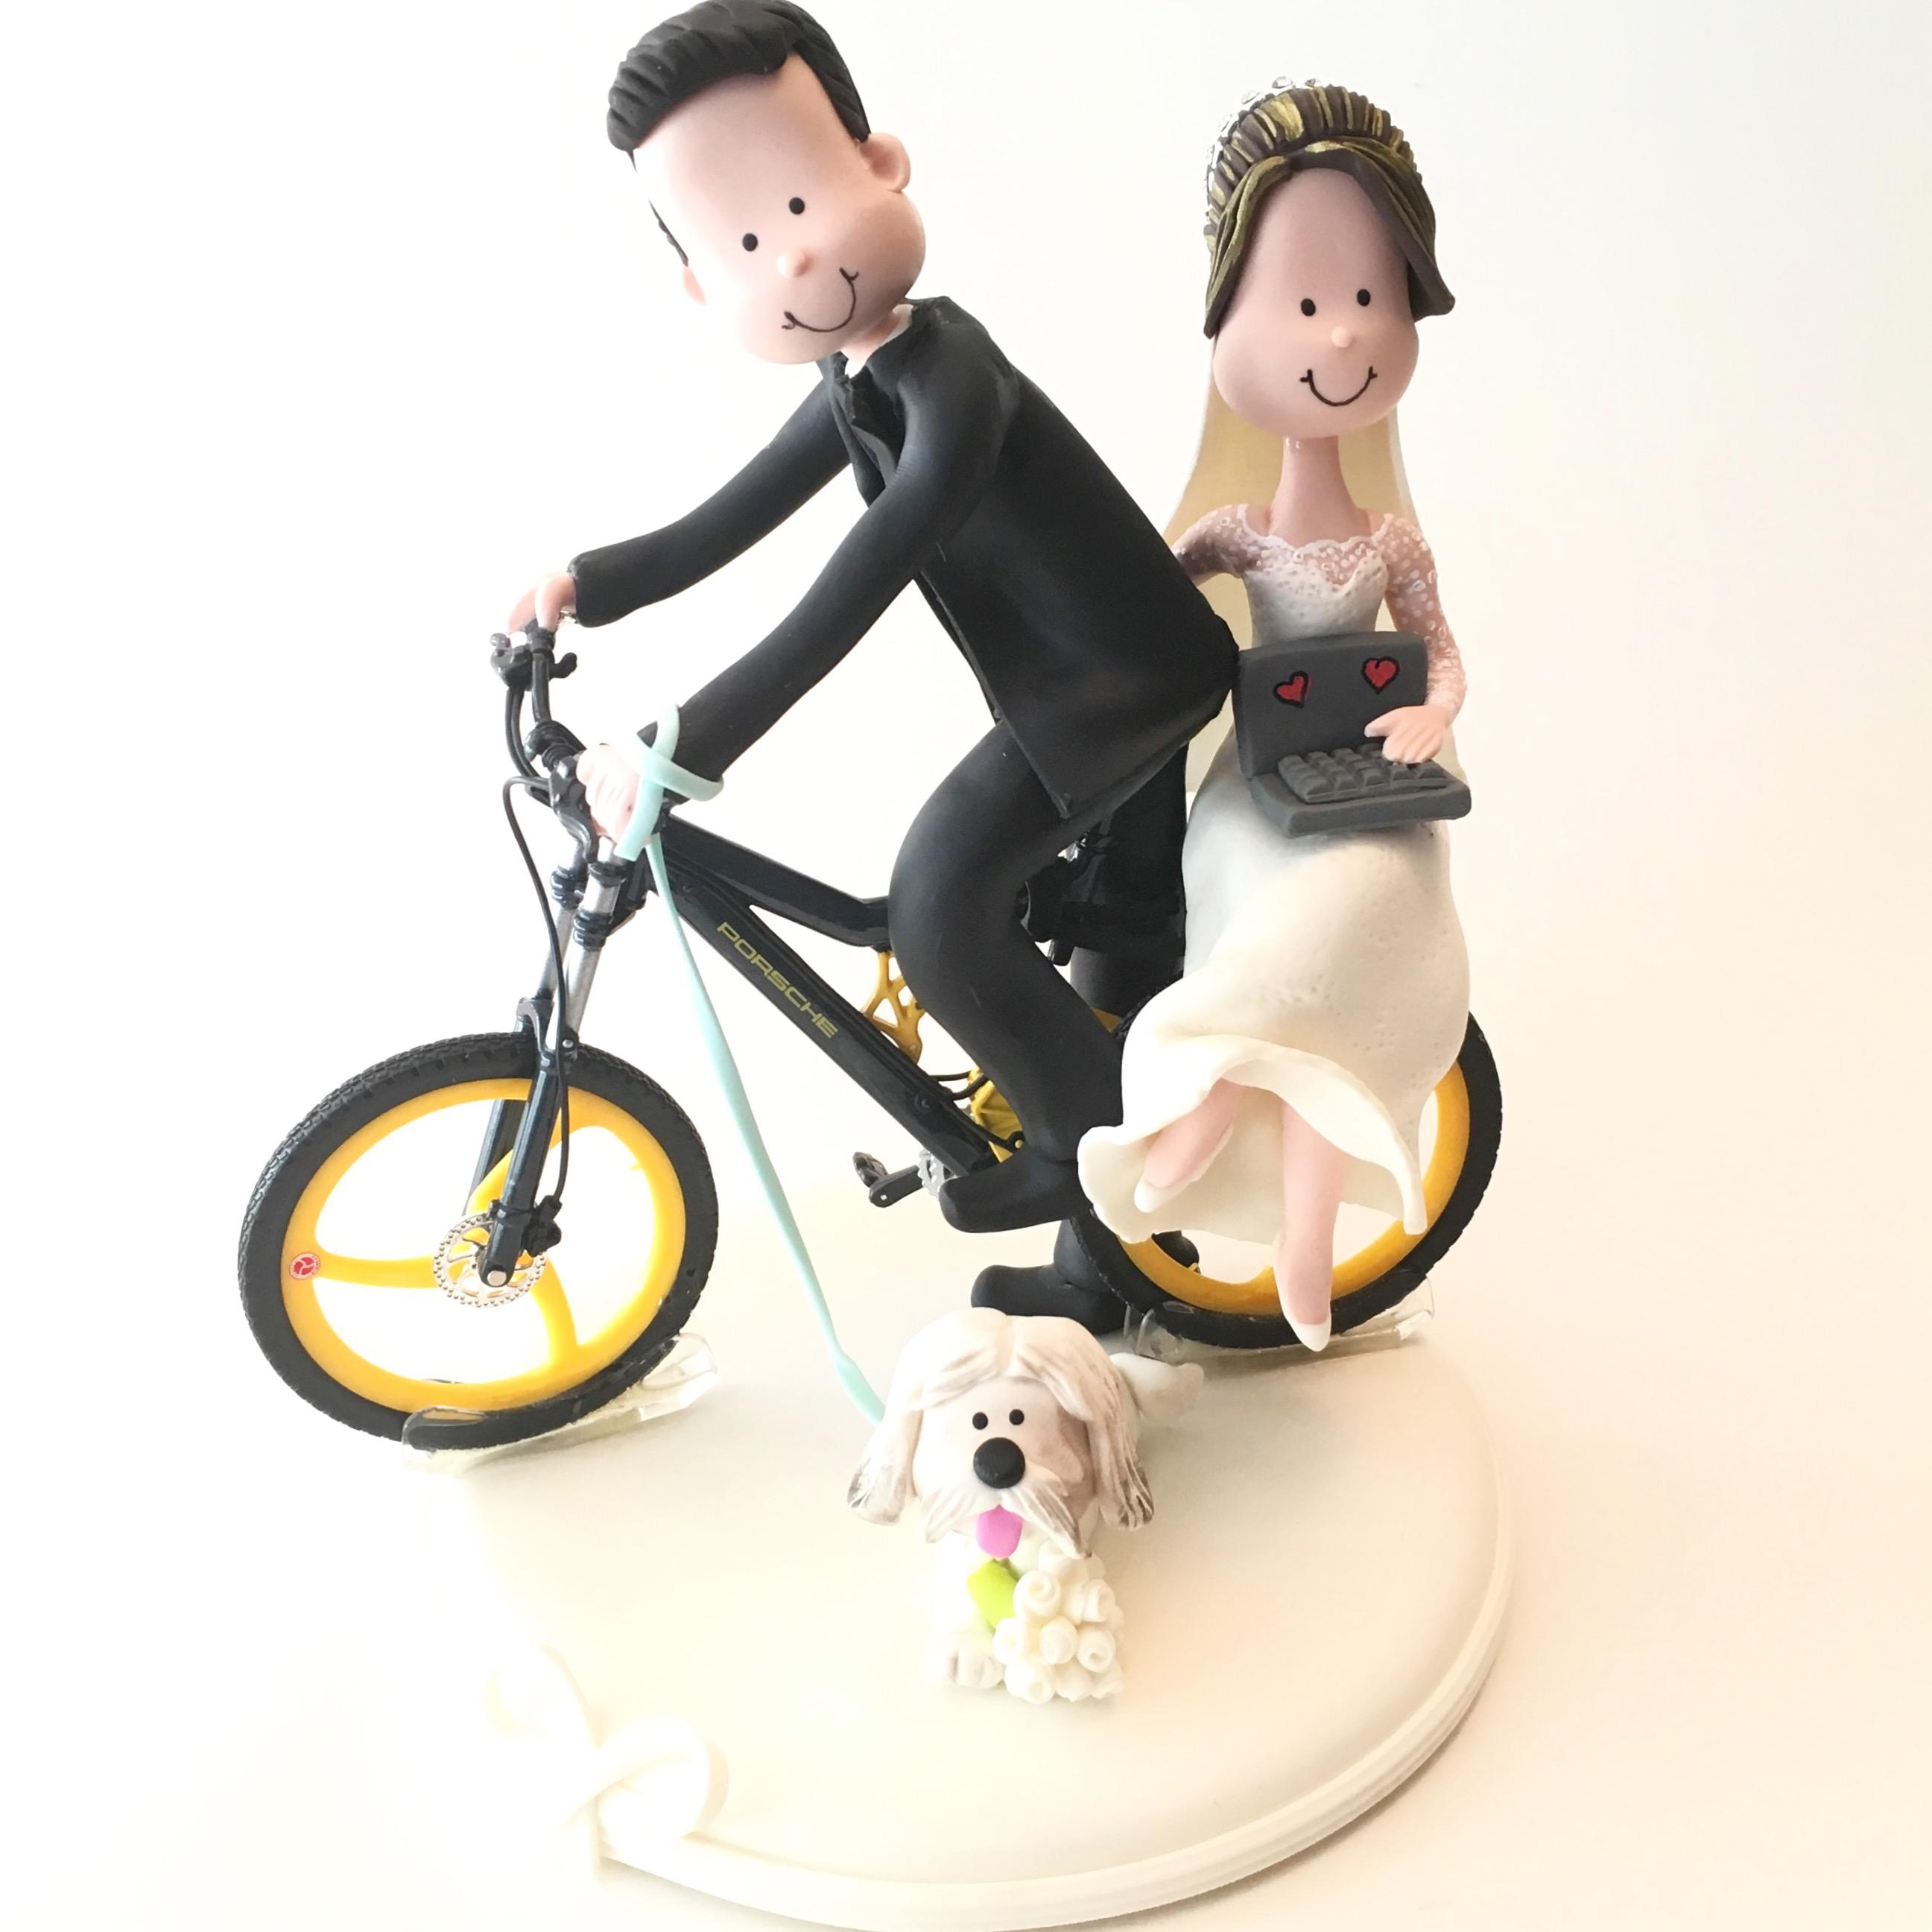 wedding-cake-topper-funny-bike-7